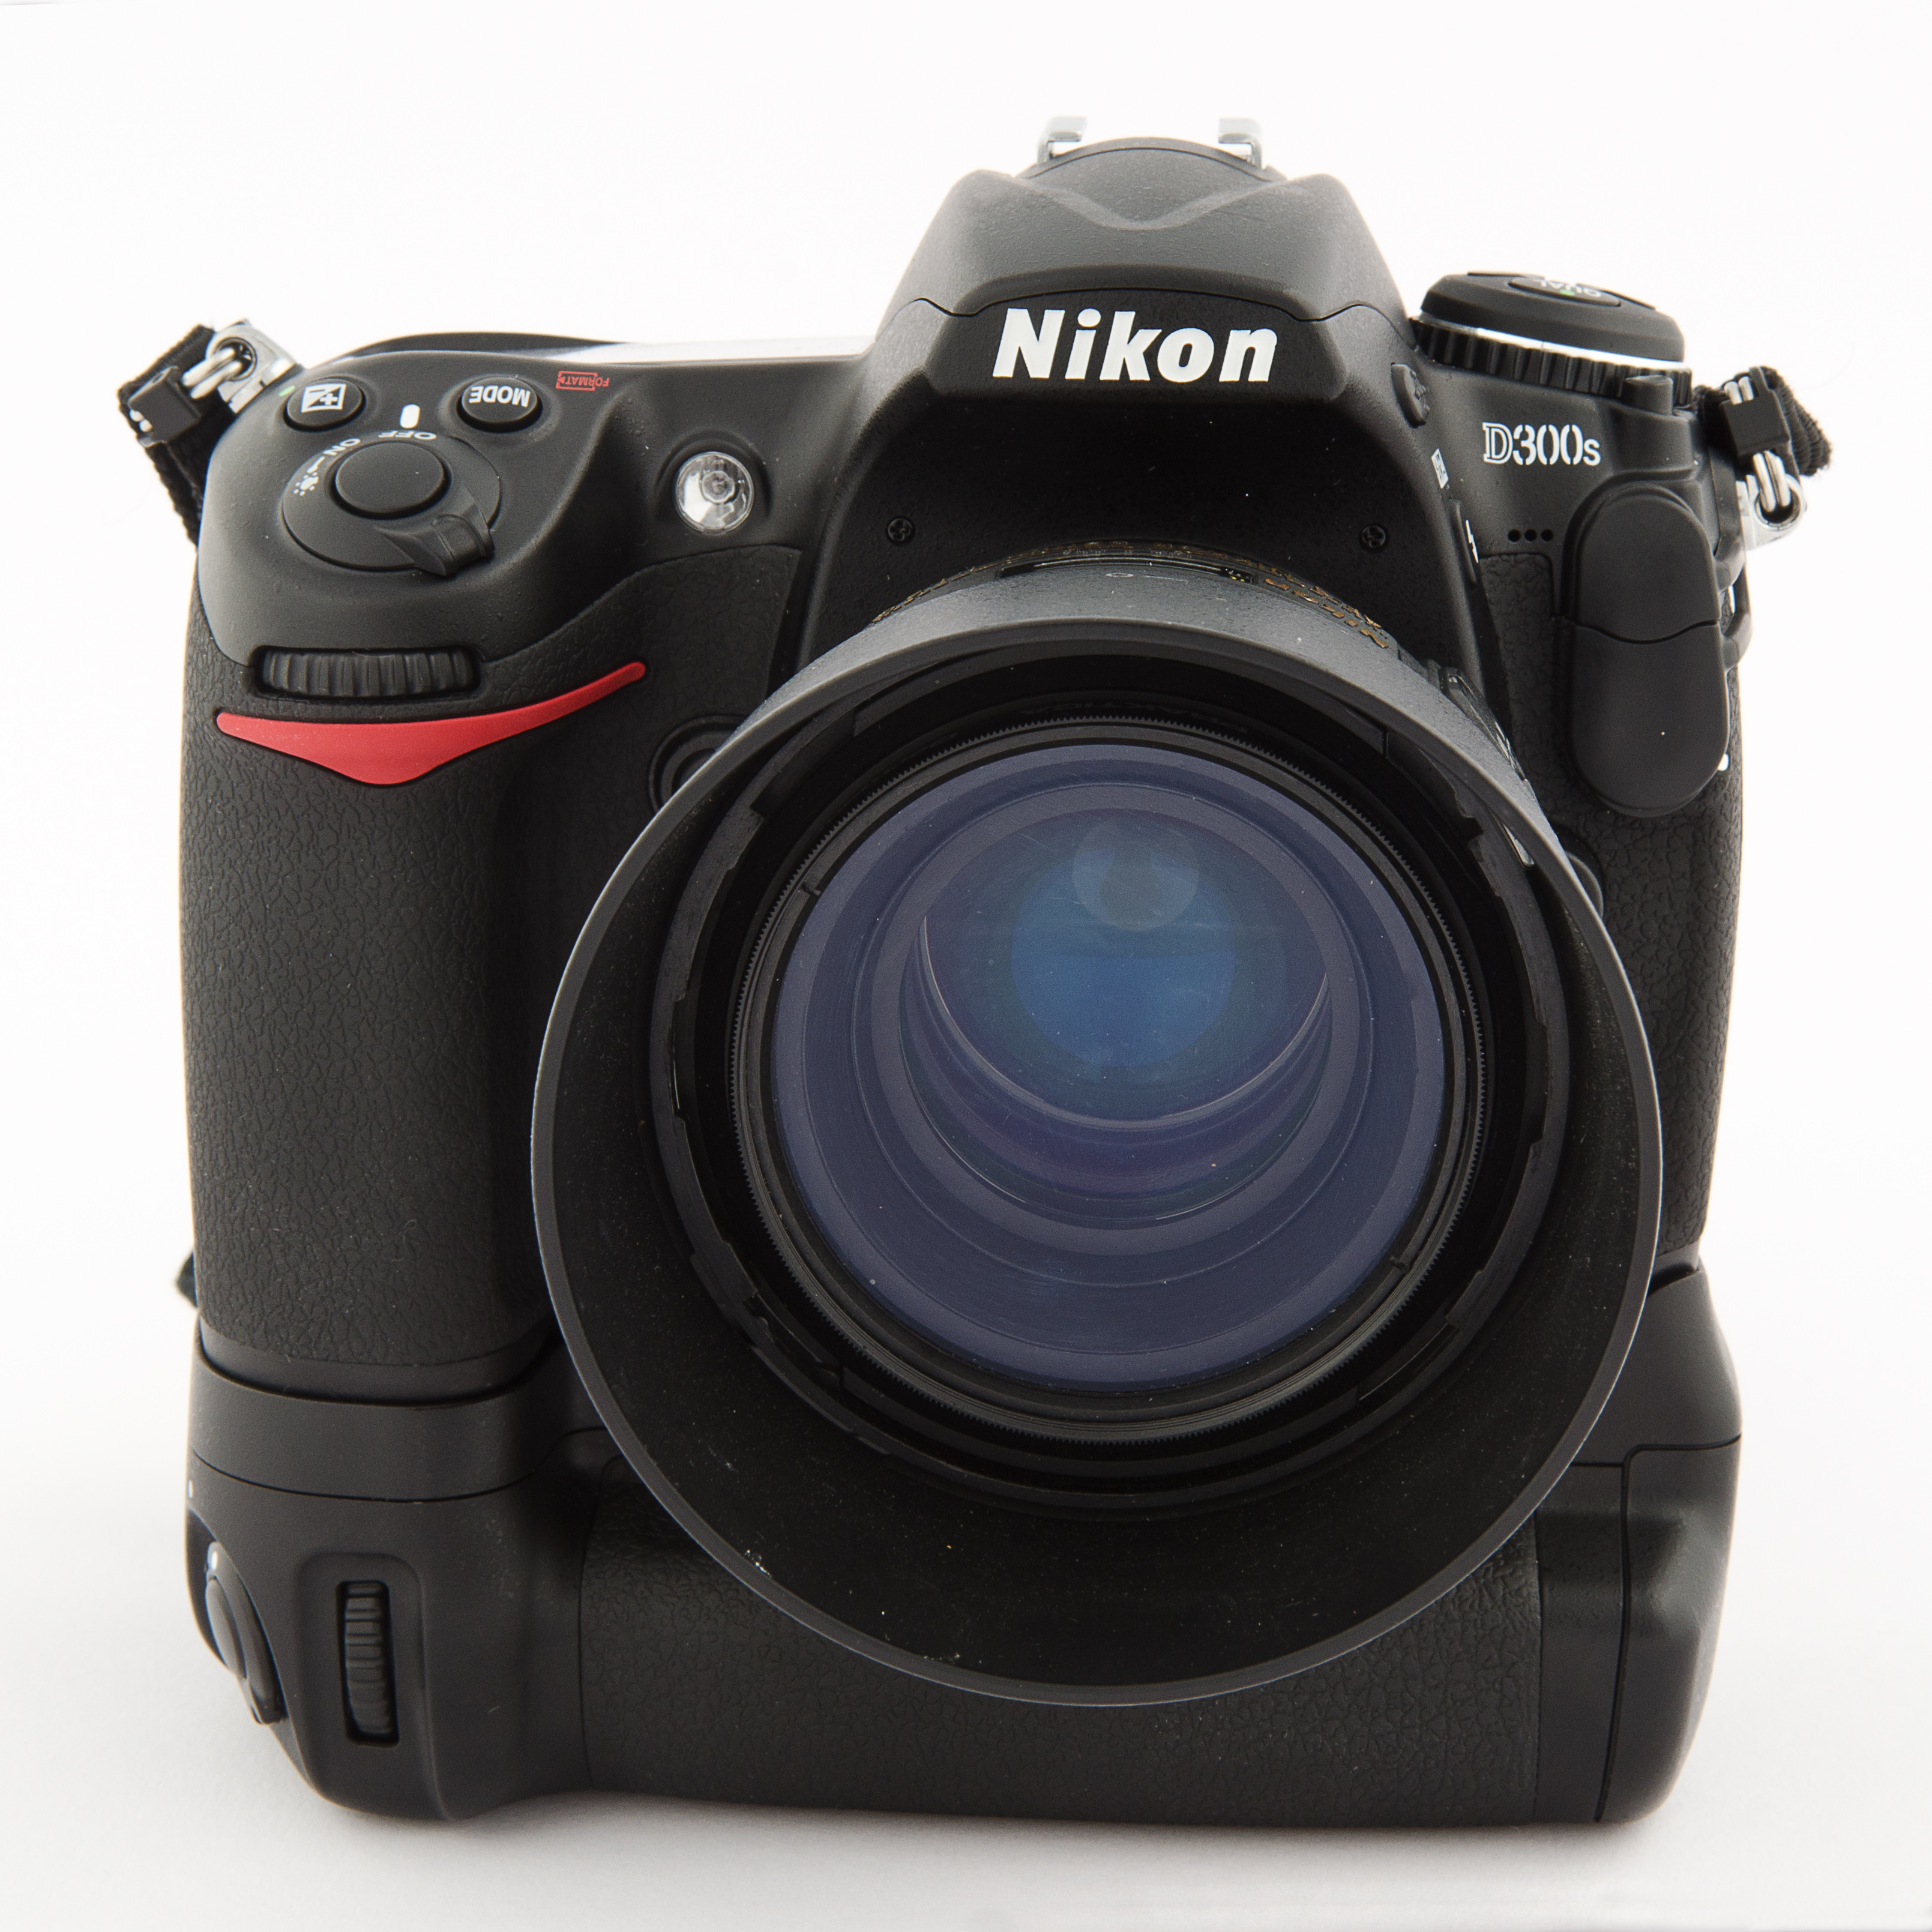 11-09-04-nikon-d300s-by-RalfR-DSC 5378.jpg